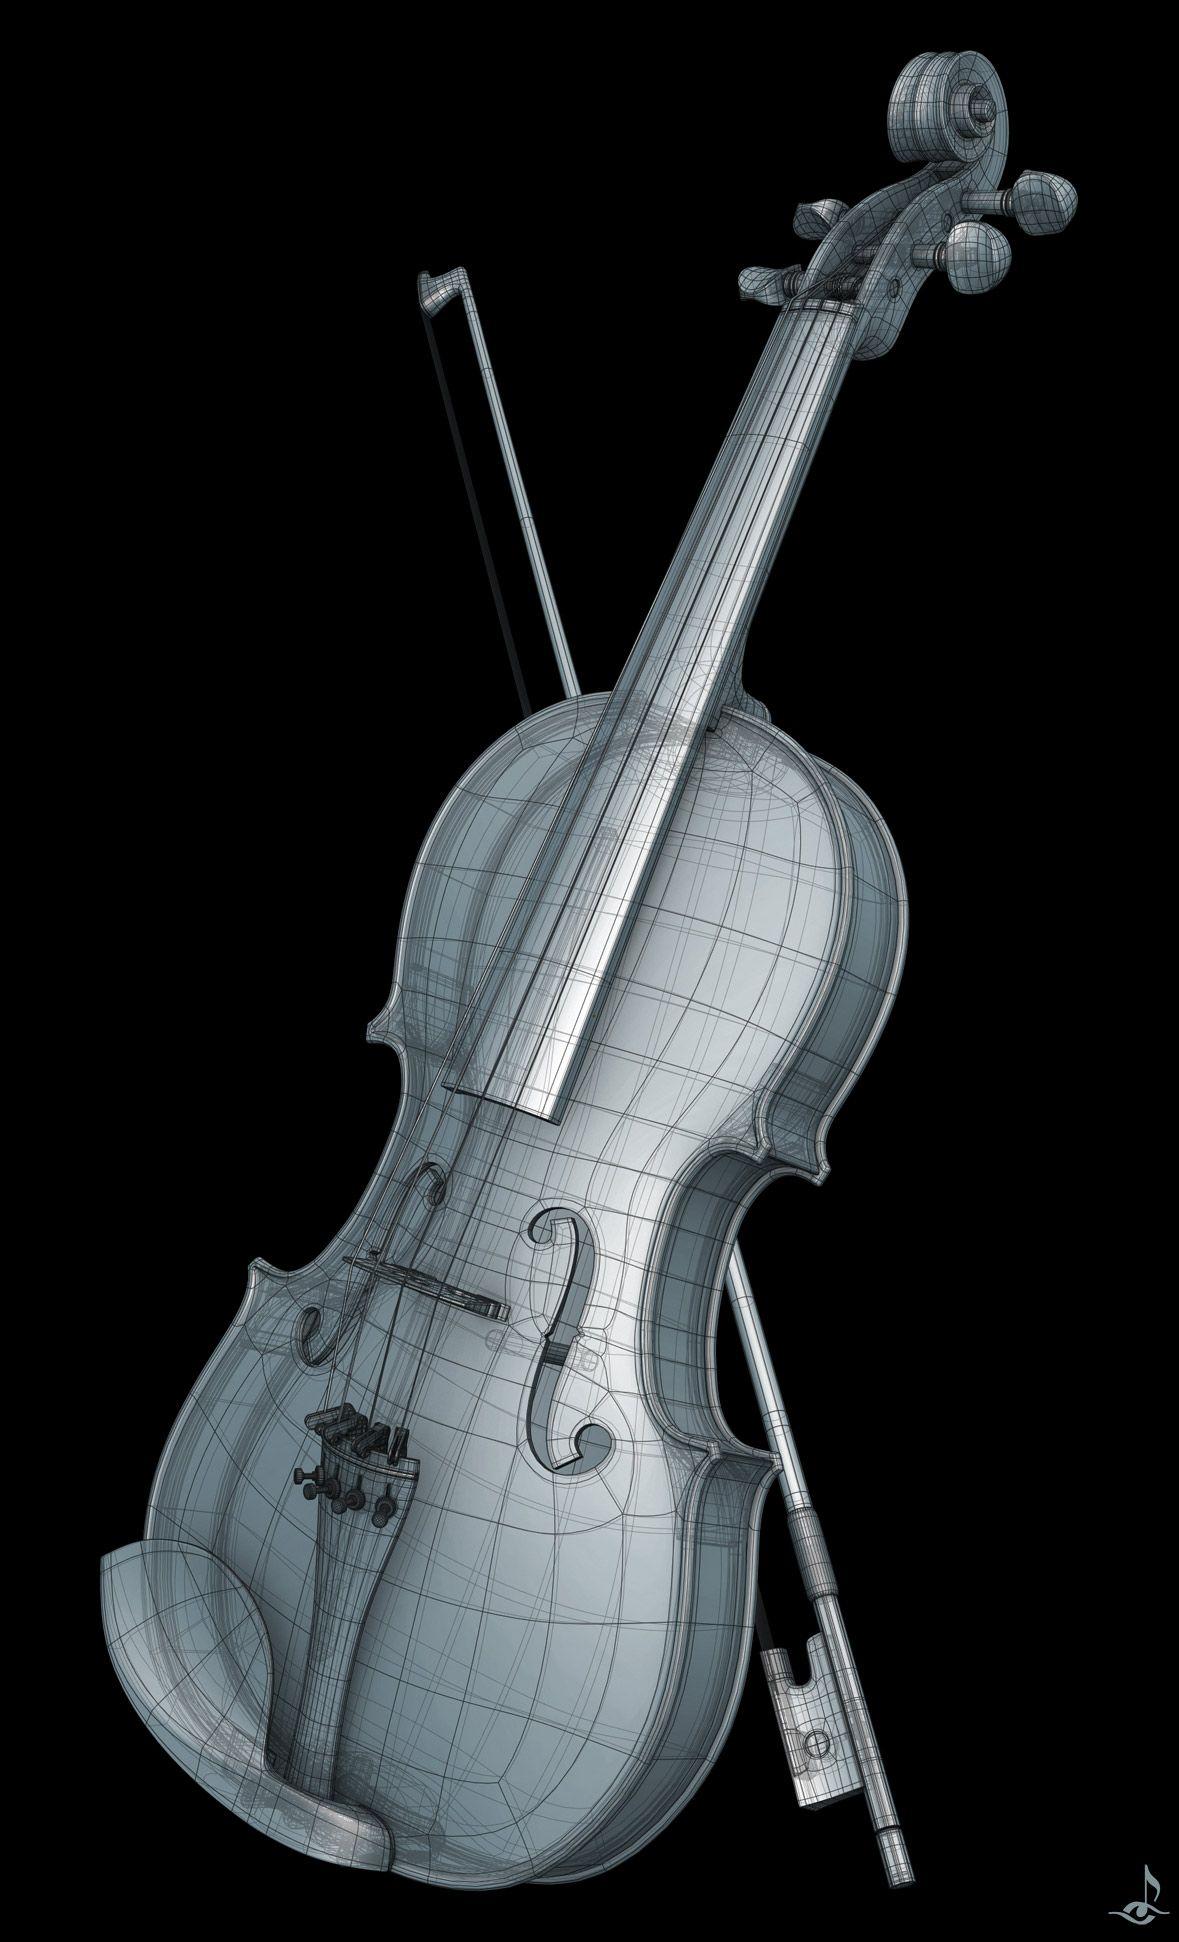 Violin Topology by johnstrieder on deviantart